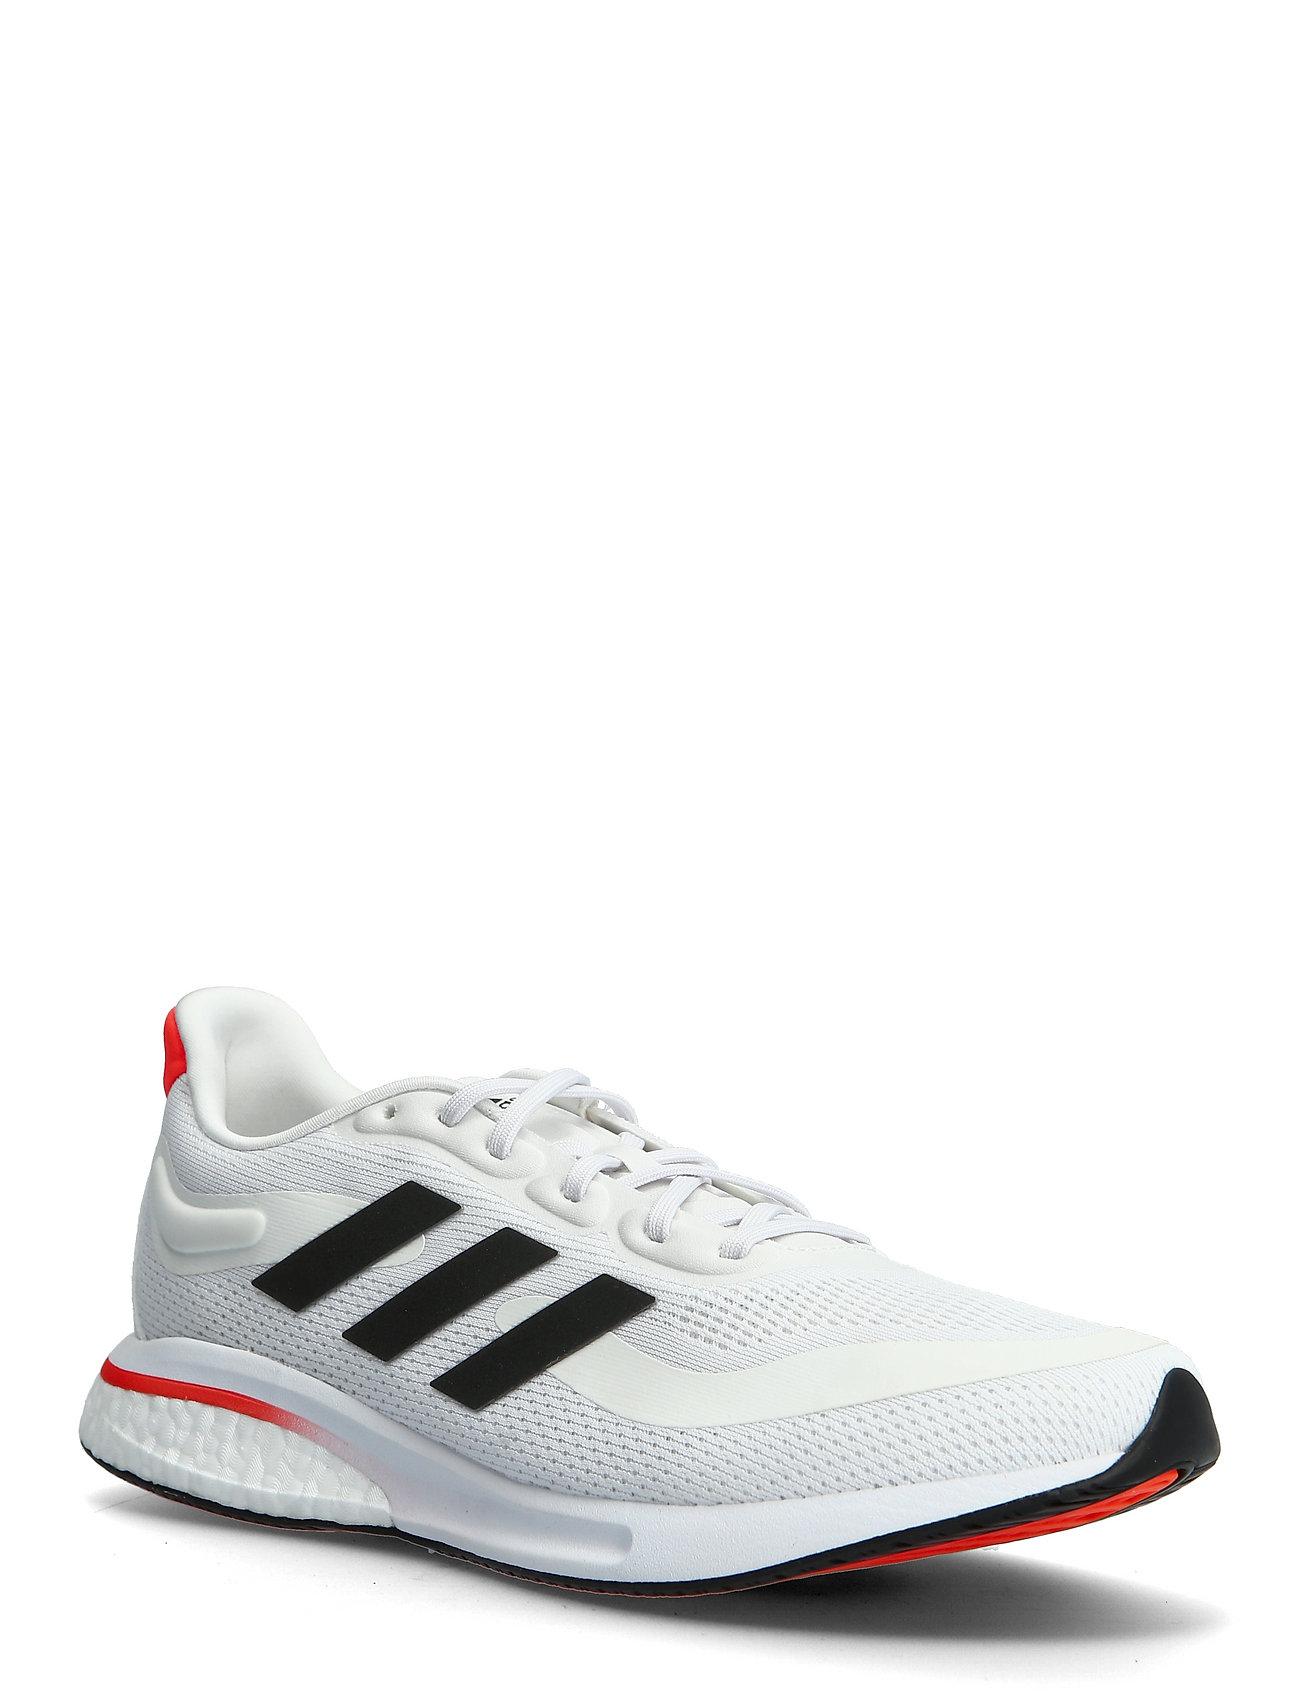 Supernova Tokyo Shoes Sport Shoes Running Shoes Hvid Adidas Performance